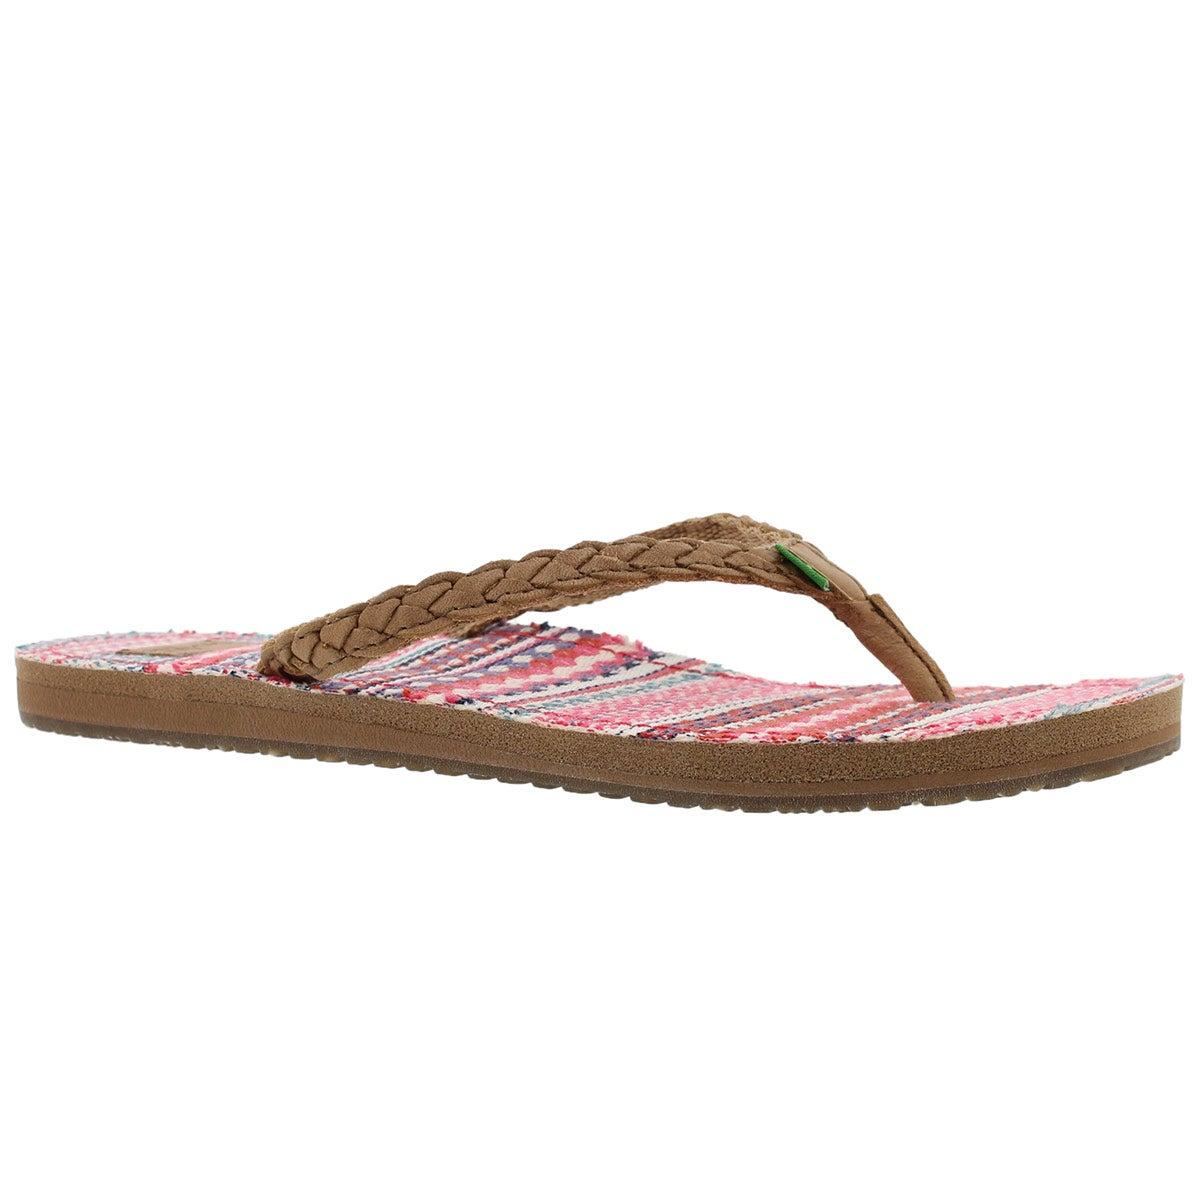 Women's YOGA PONCHO VIVA tobbaco/rasp flip flops